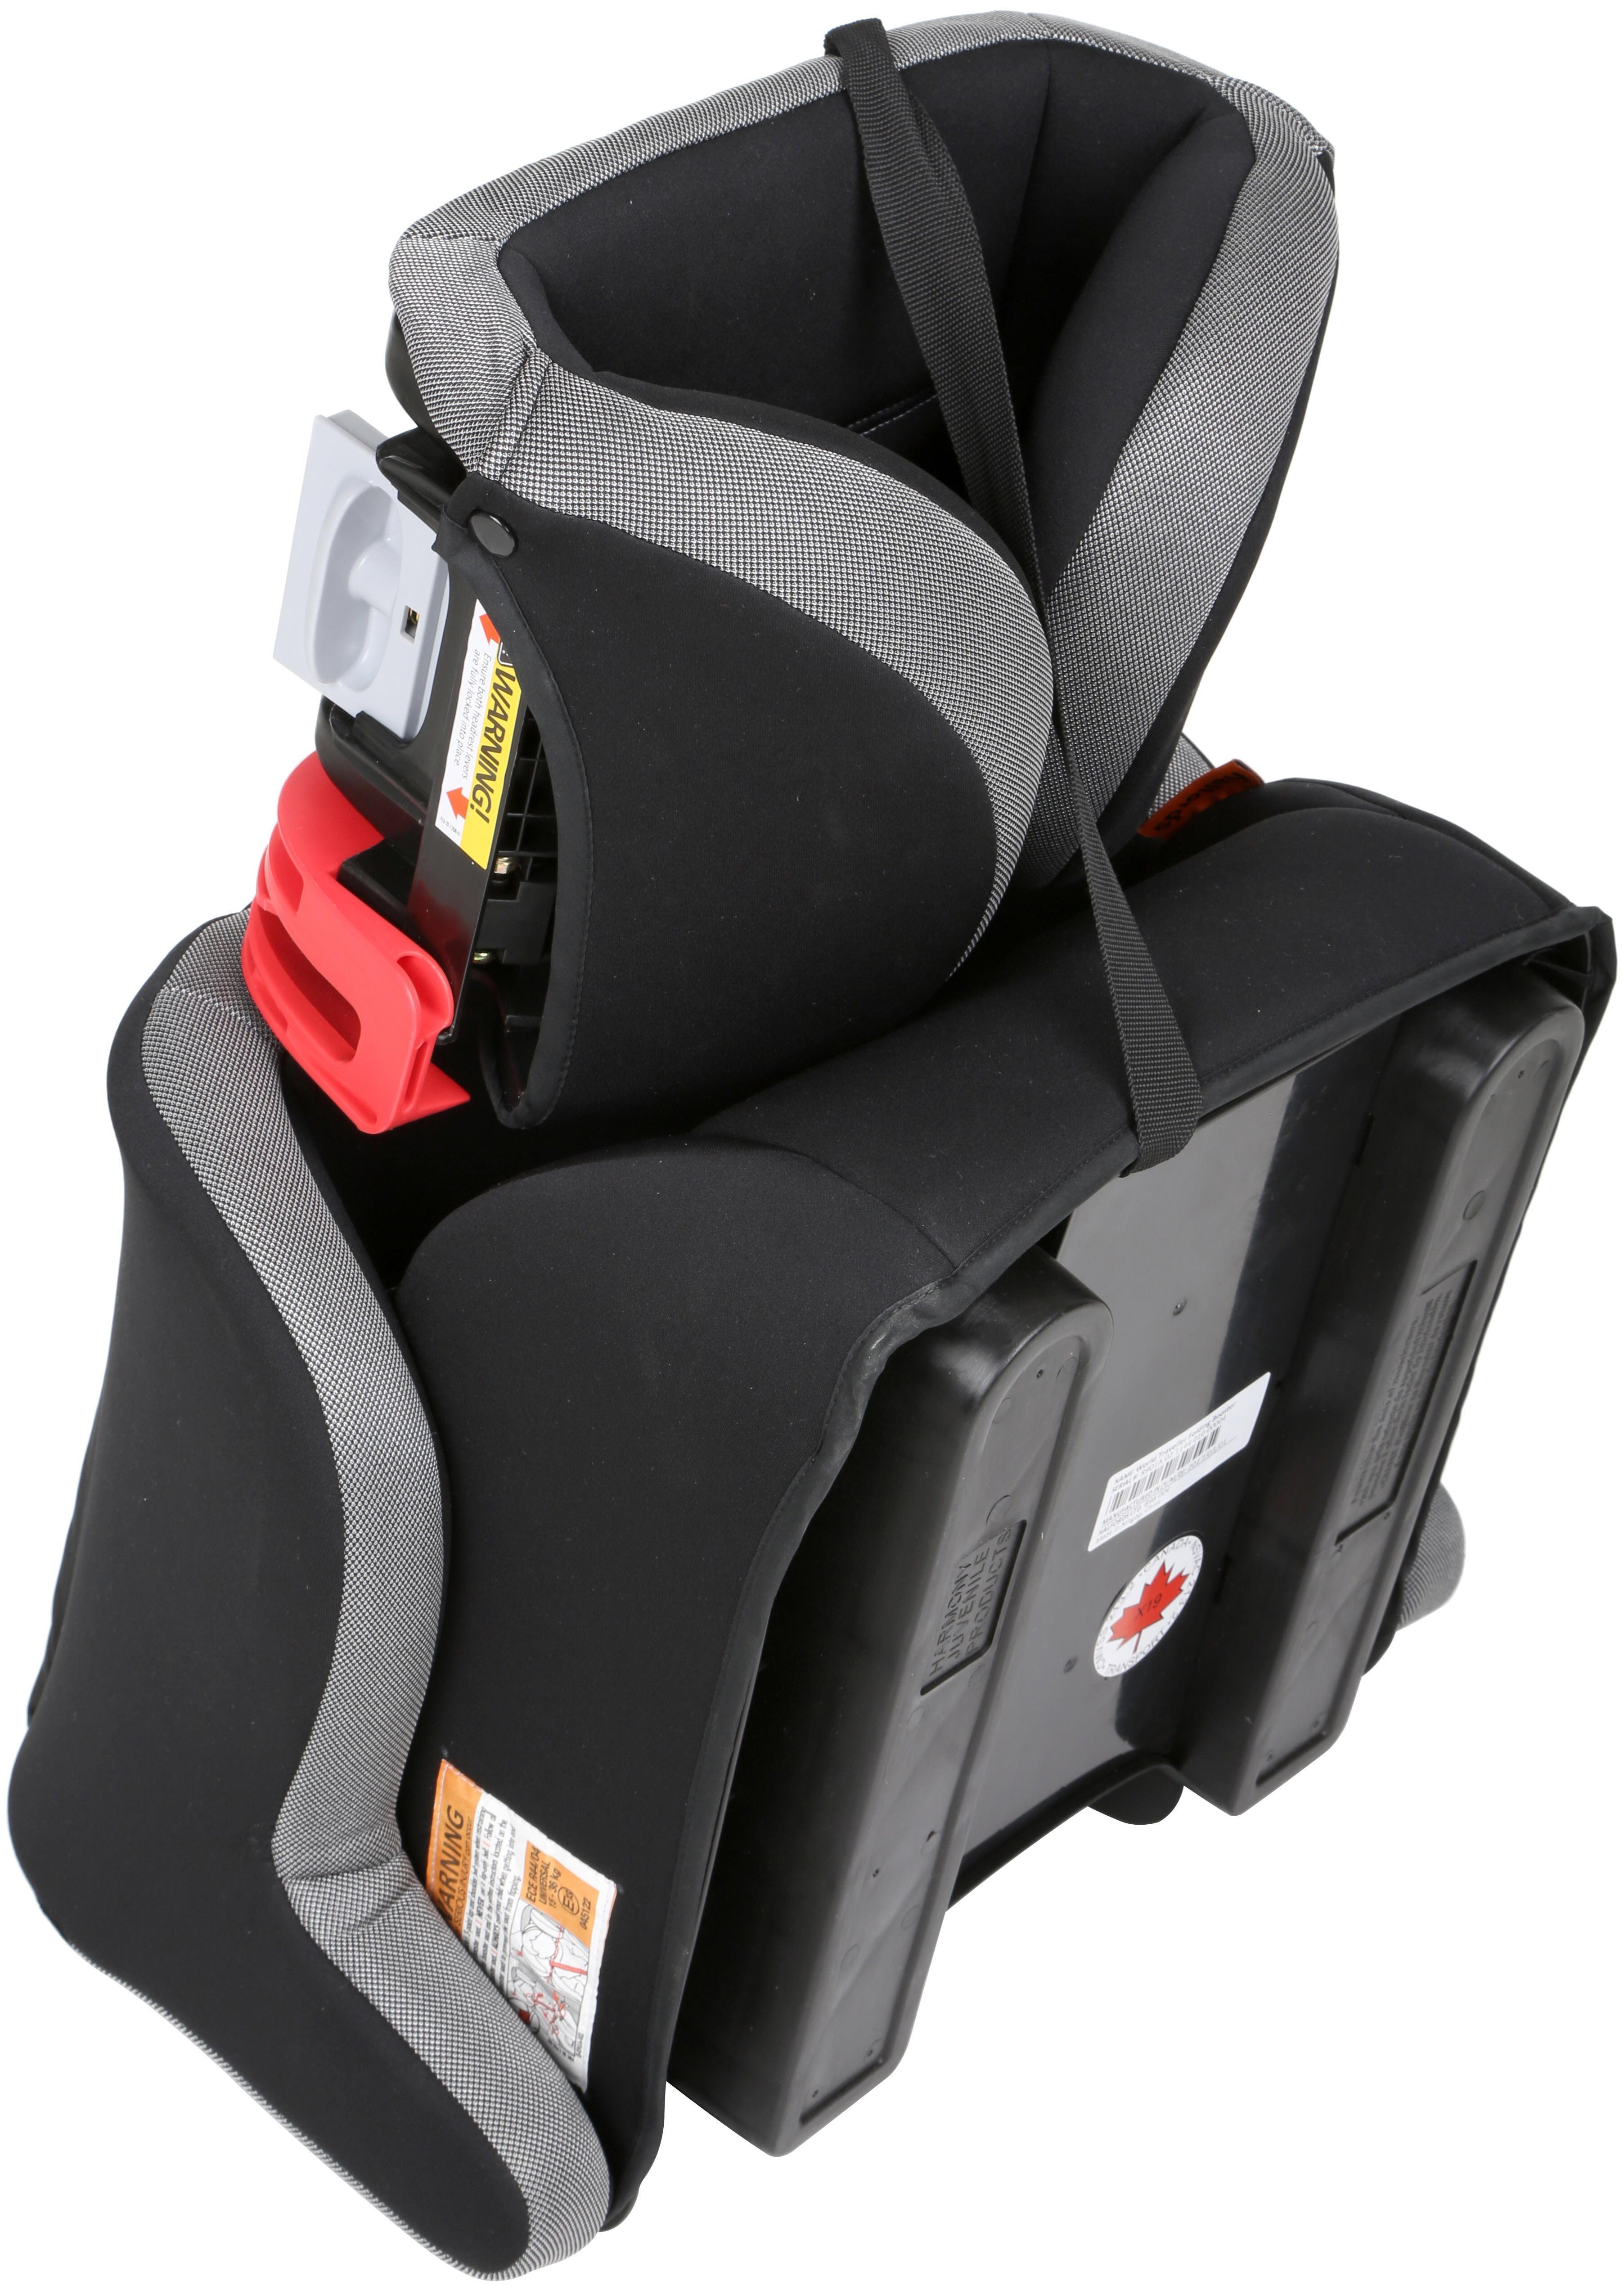 Halfords Kids Child Lightweight Travel Protector Folding Highback Booster Seat